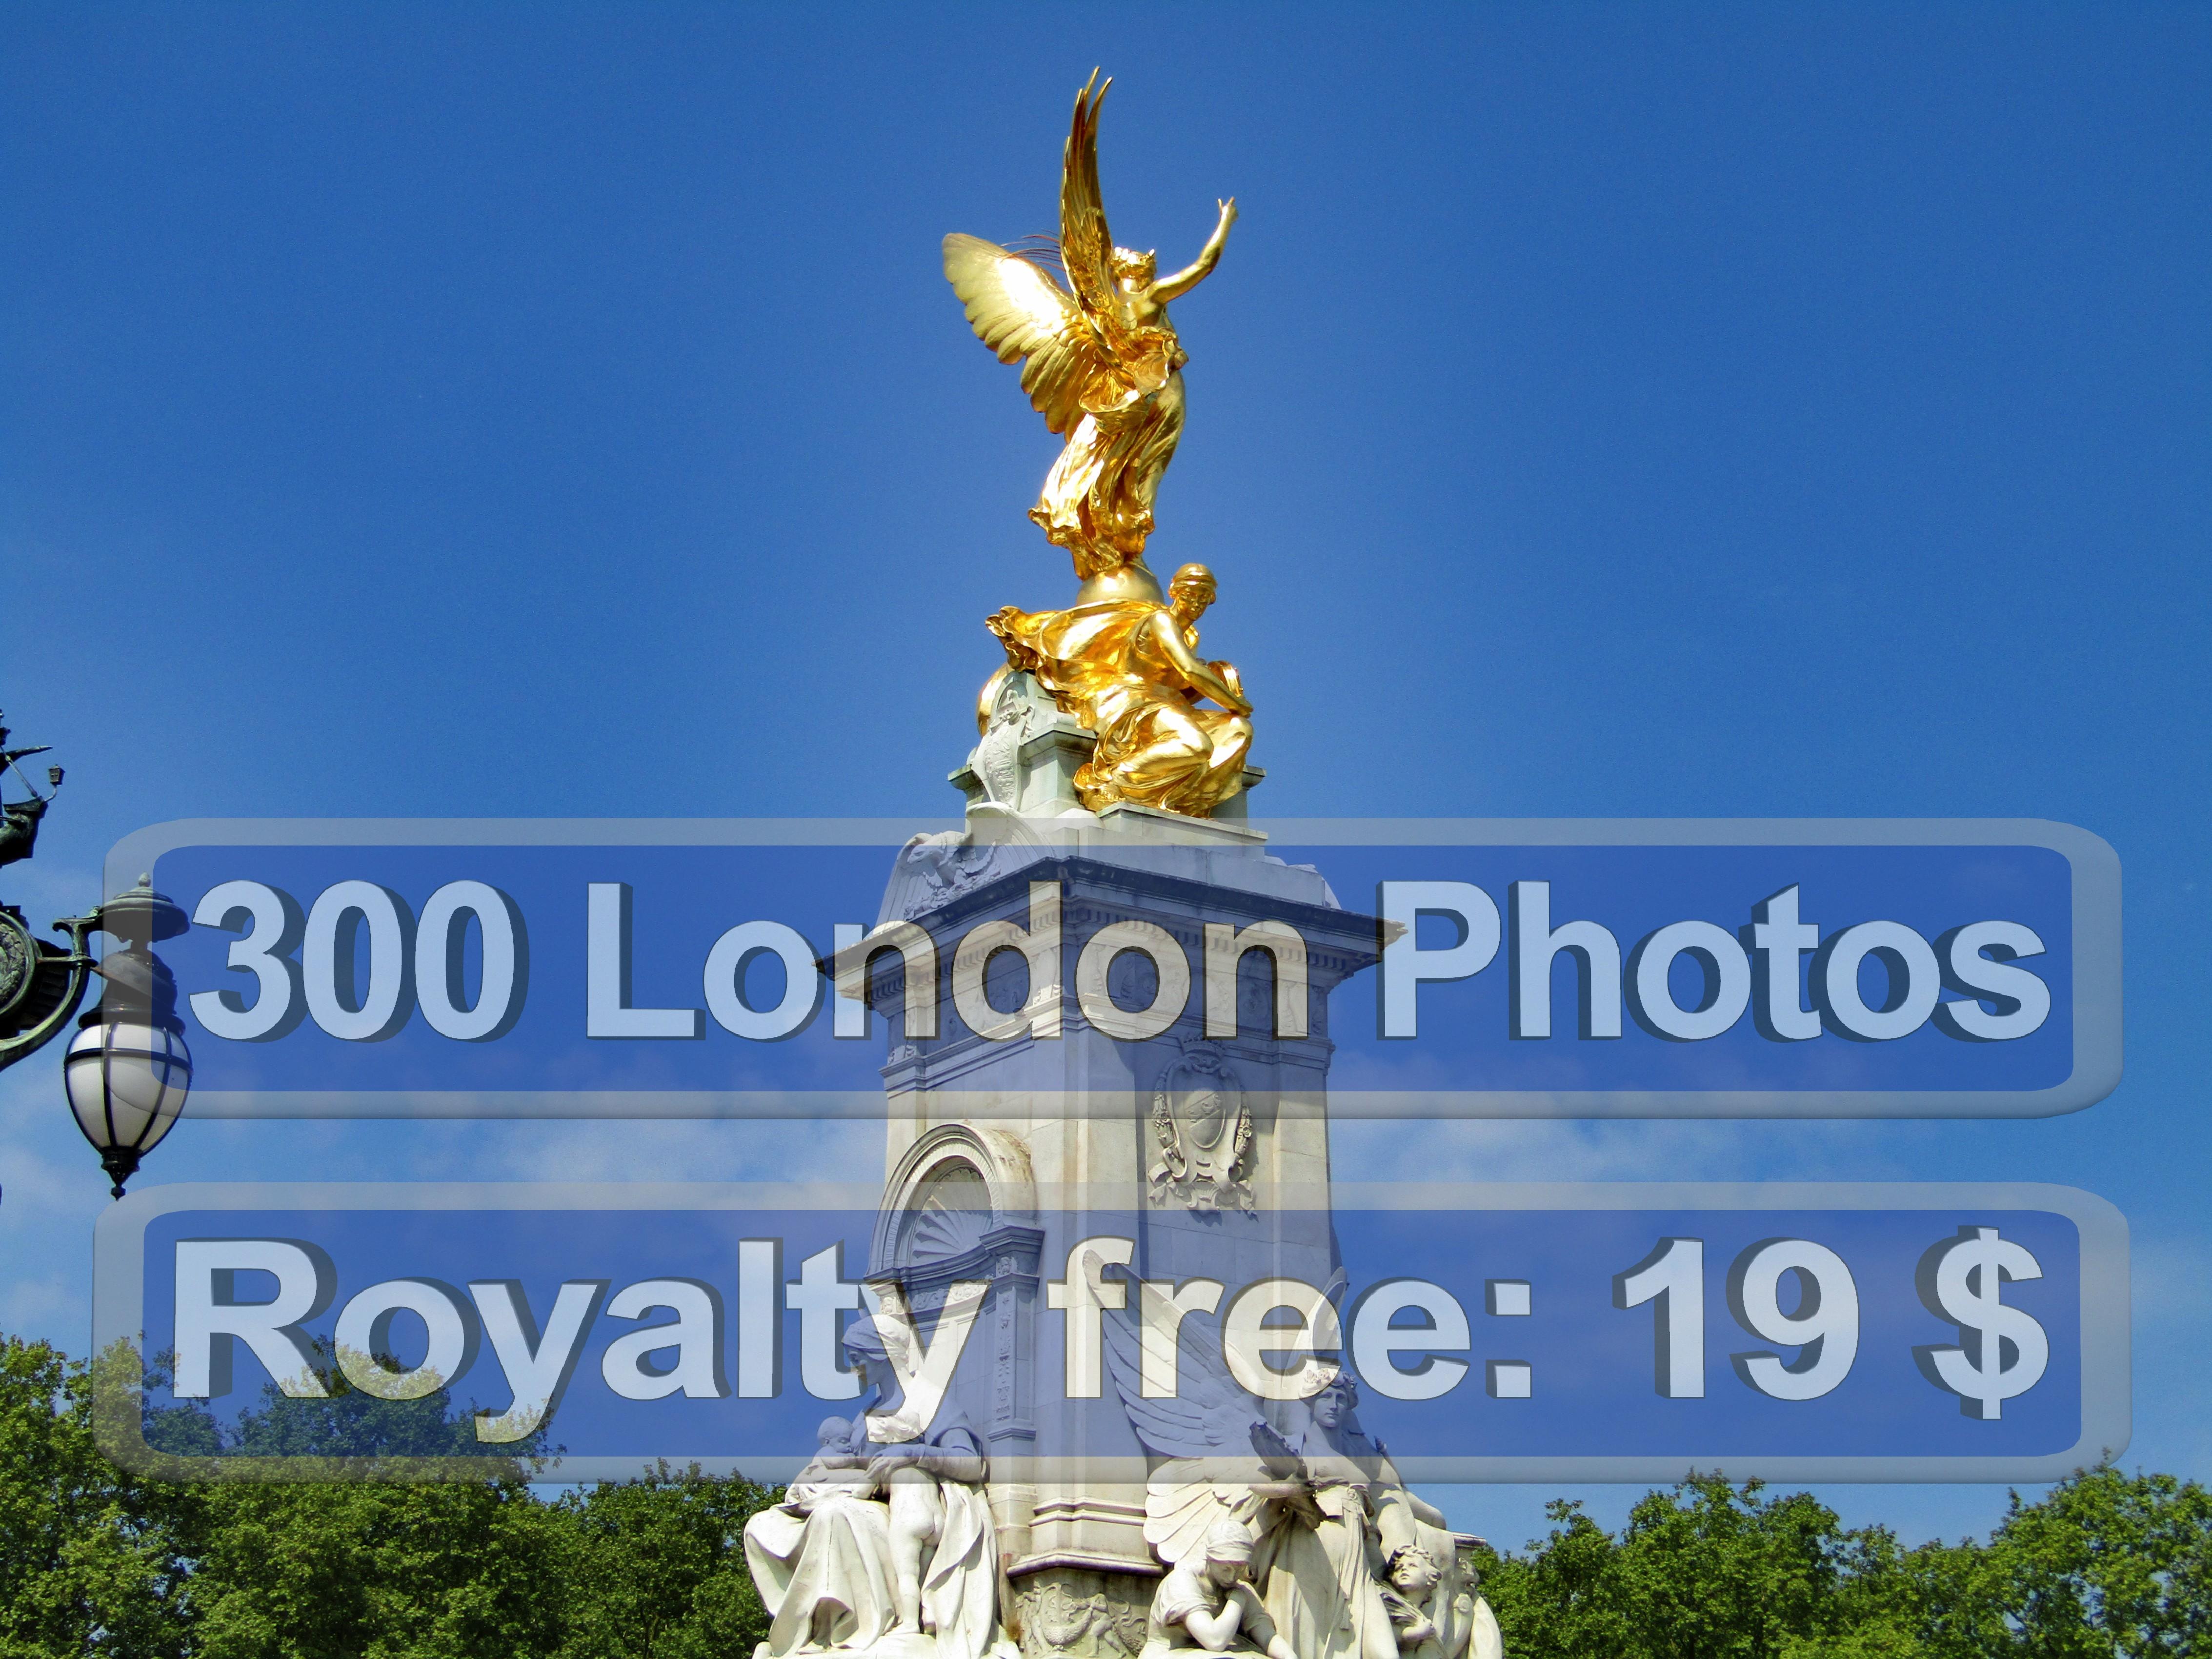 London Night Photo Spots